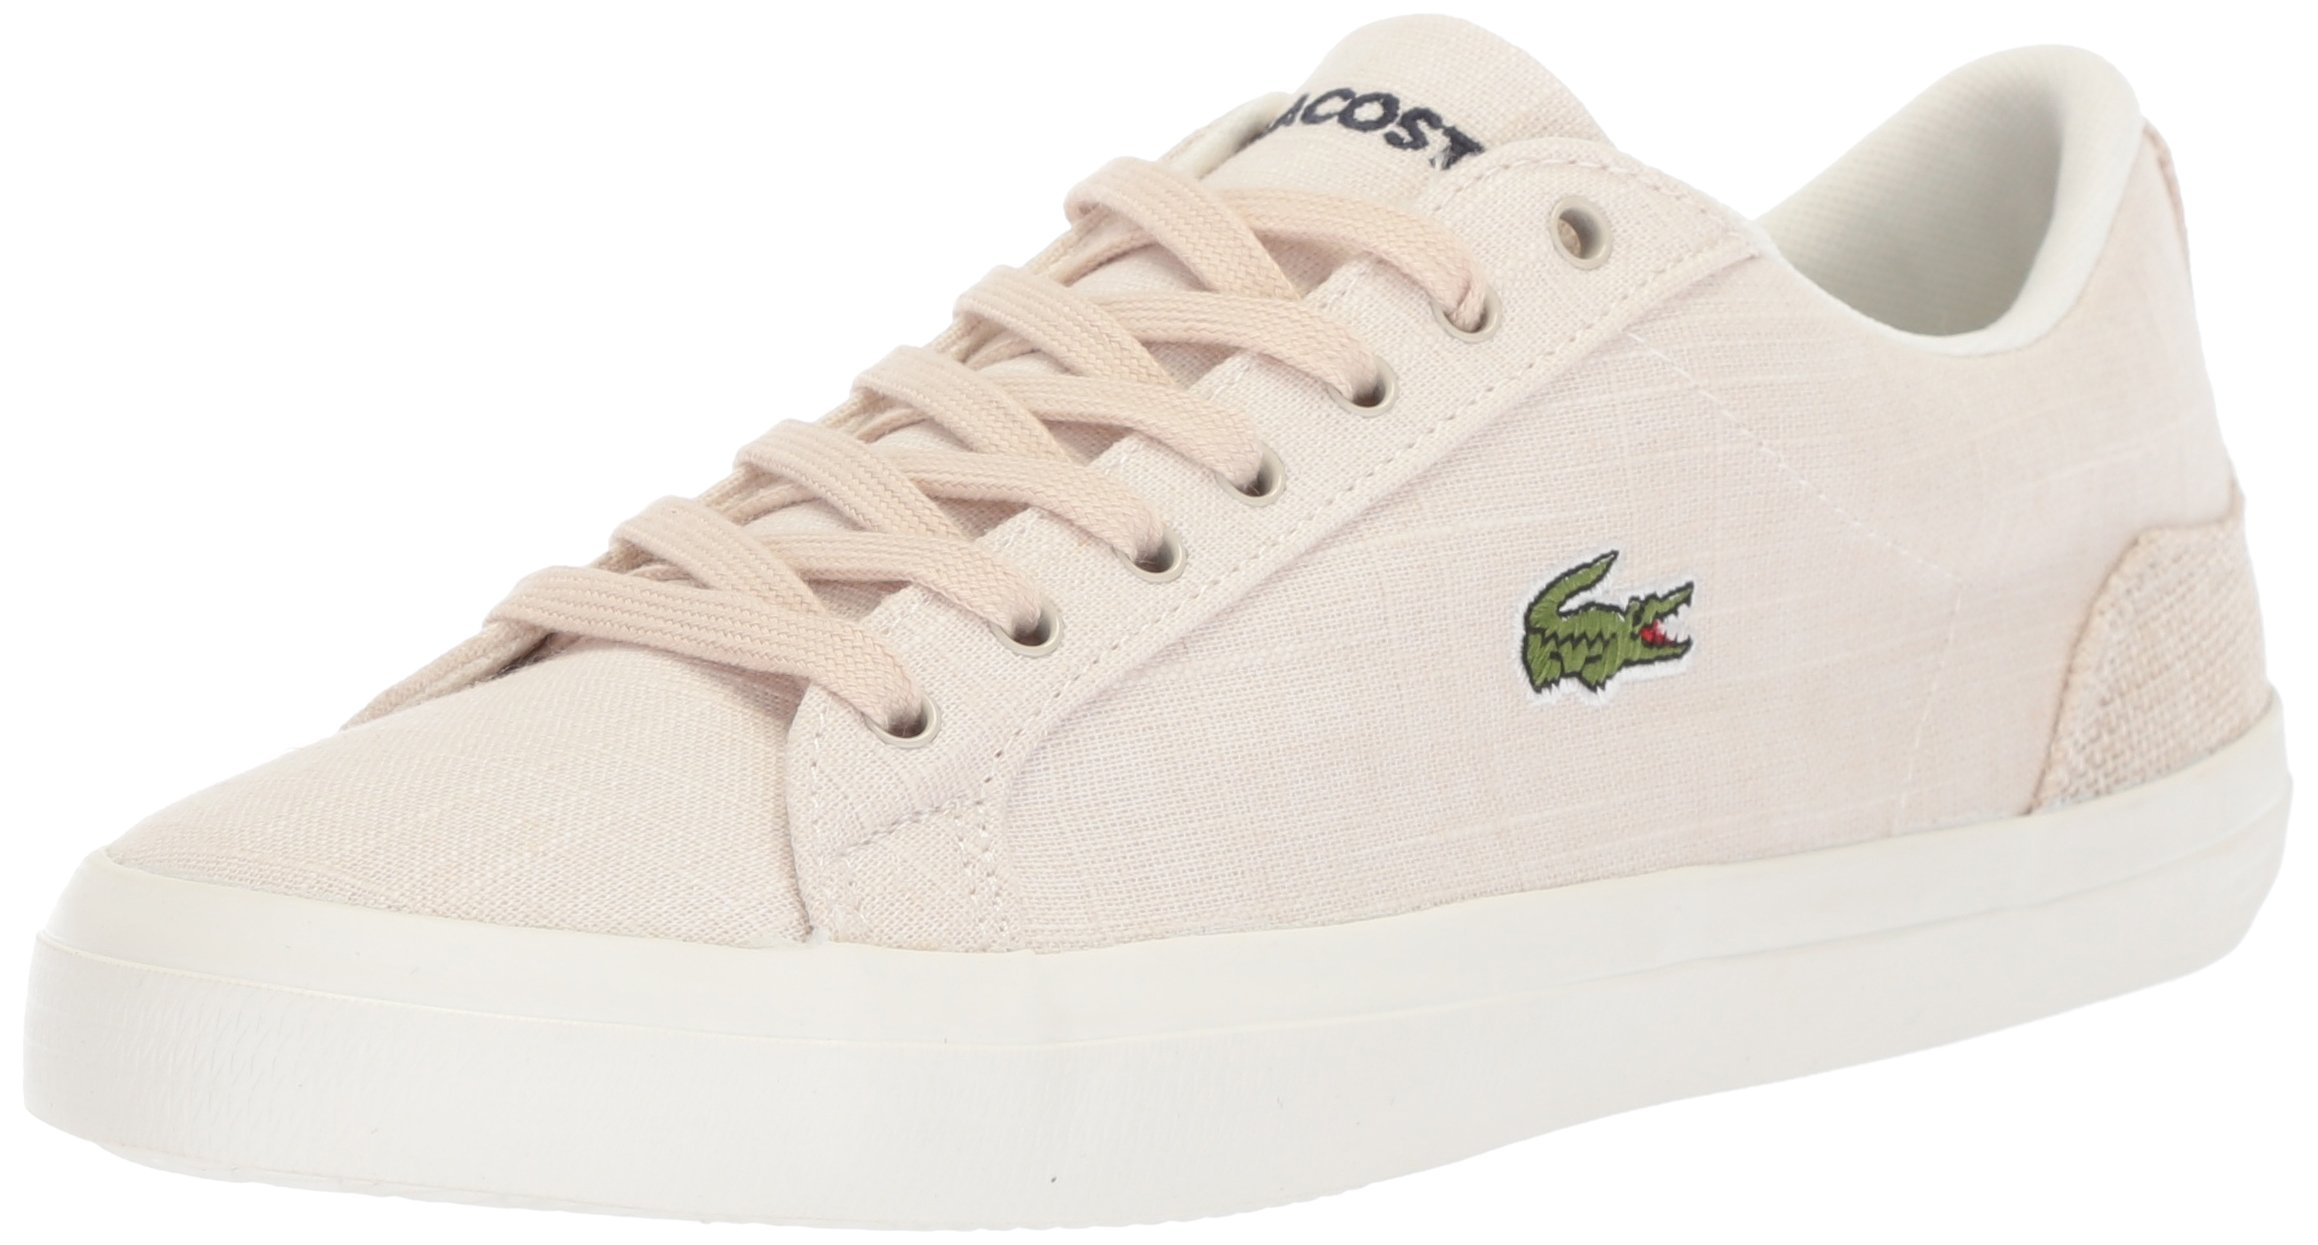 b36ce8311 Galleon - Lacoste Men s Lerond Sneaker